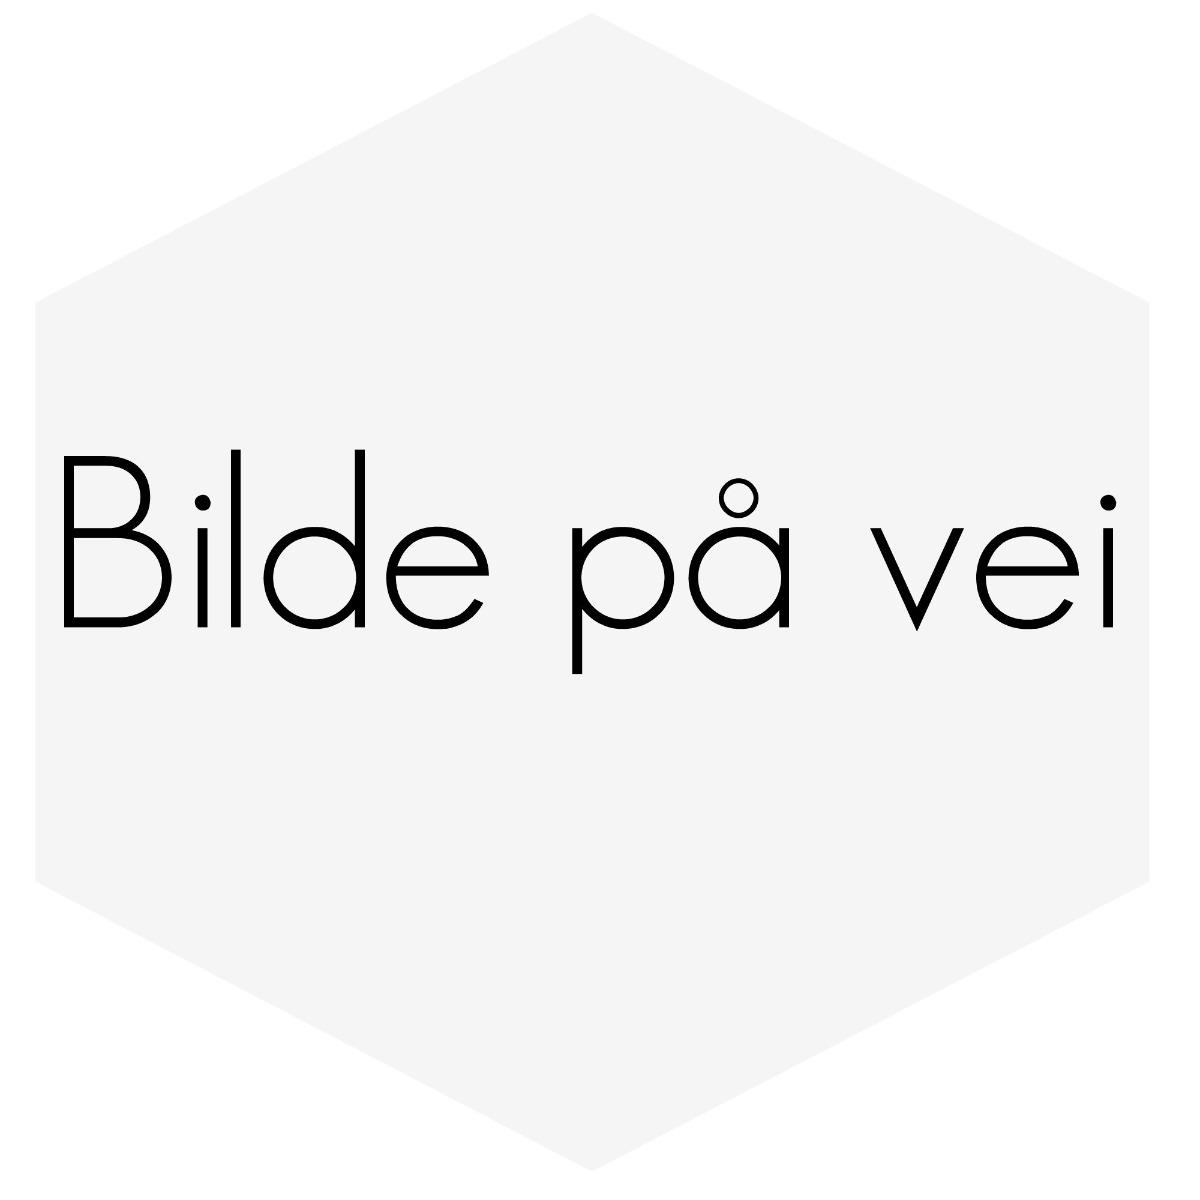 INSTRUMENT 52MM PROSPORT-S KLOKKE RØDT ELLER HVIT LYS